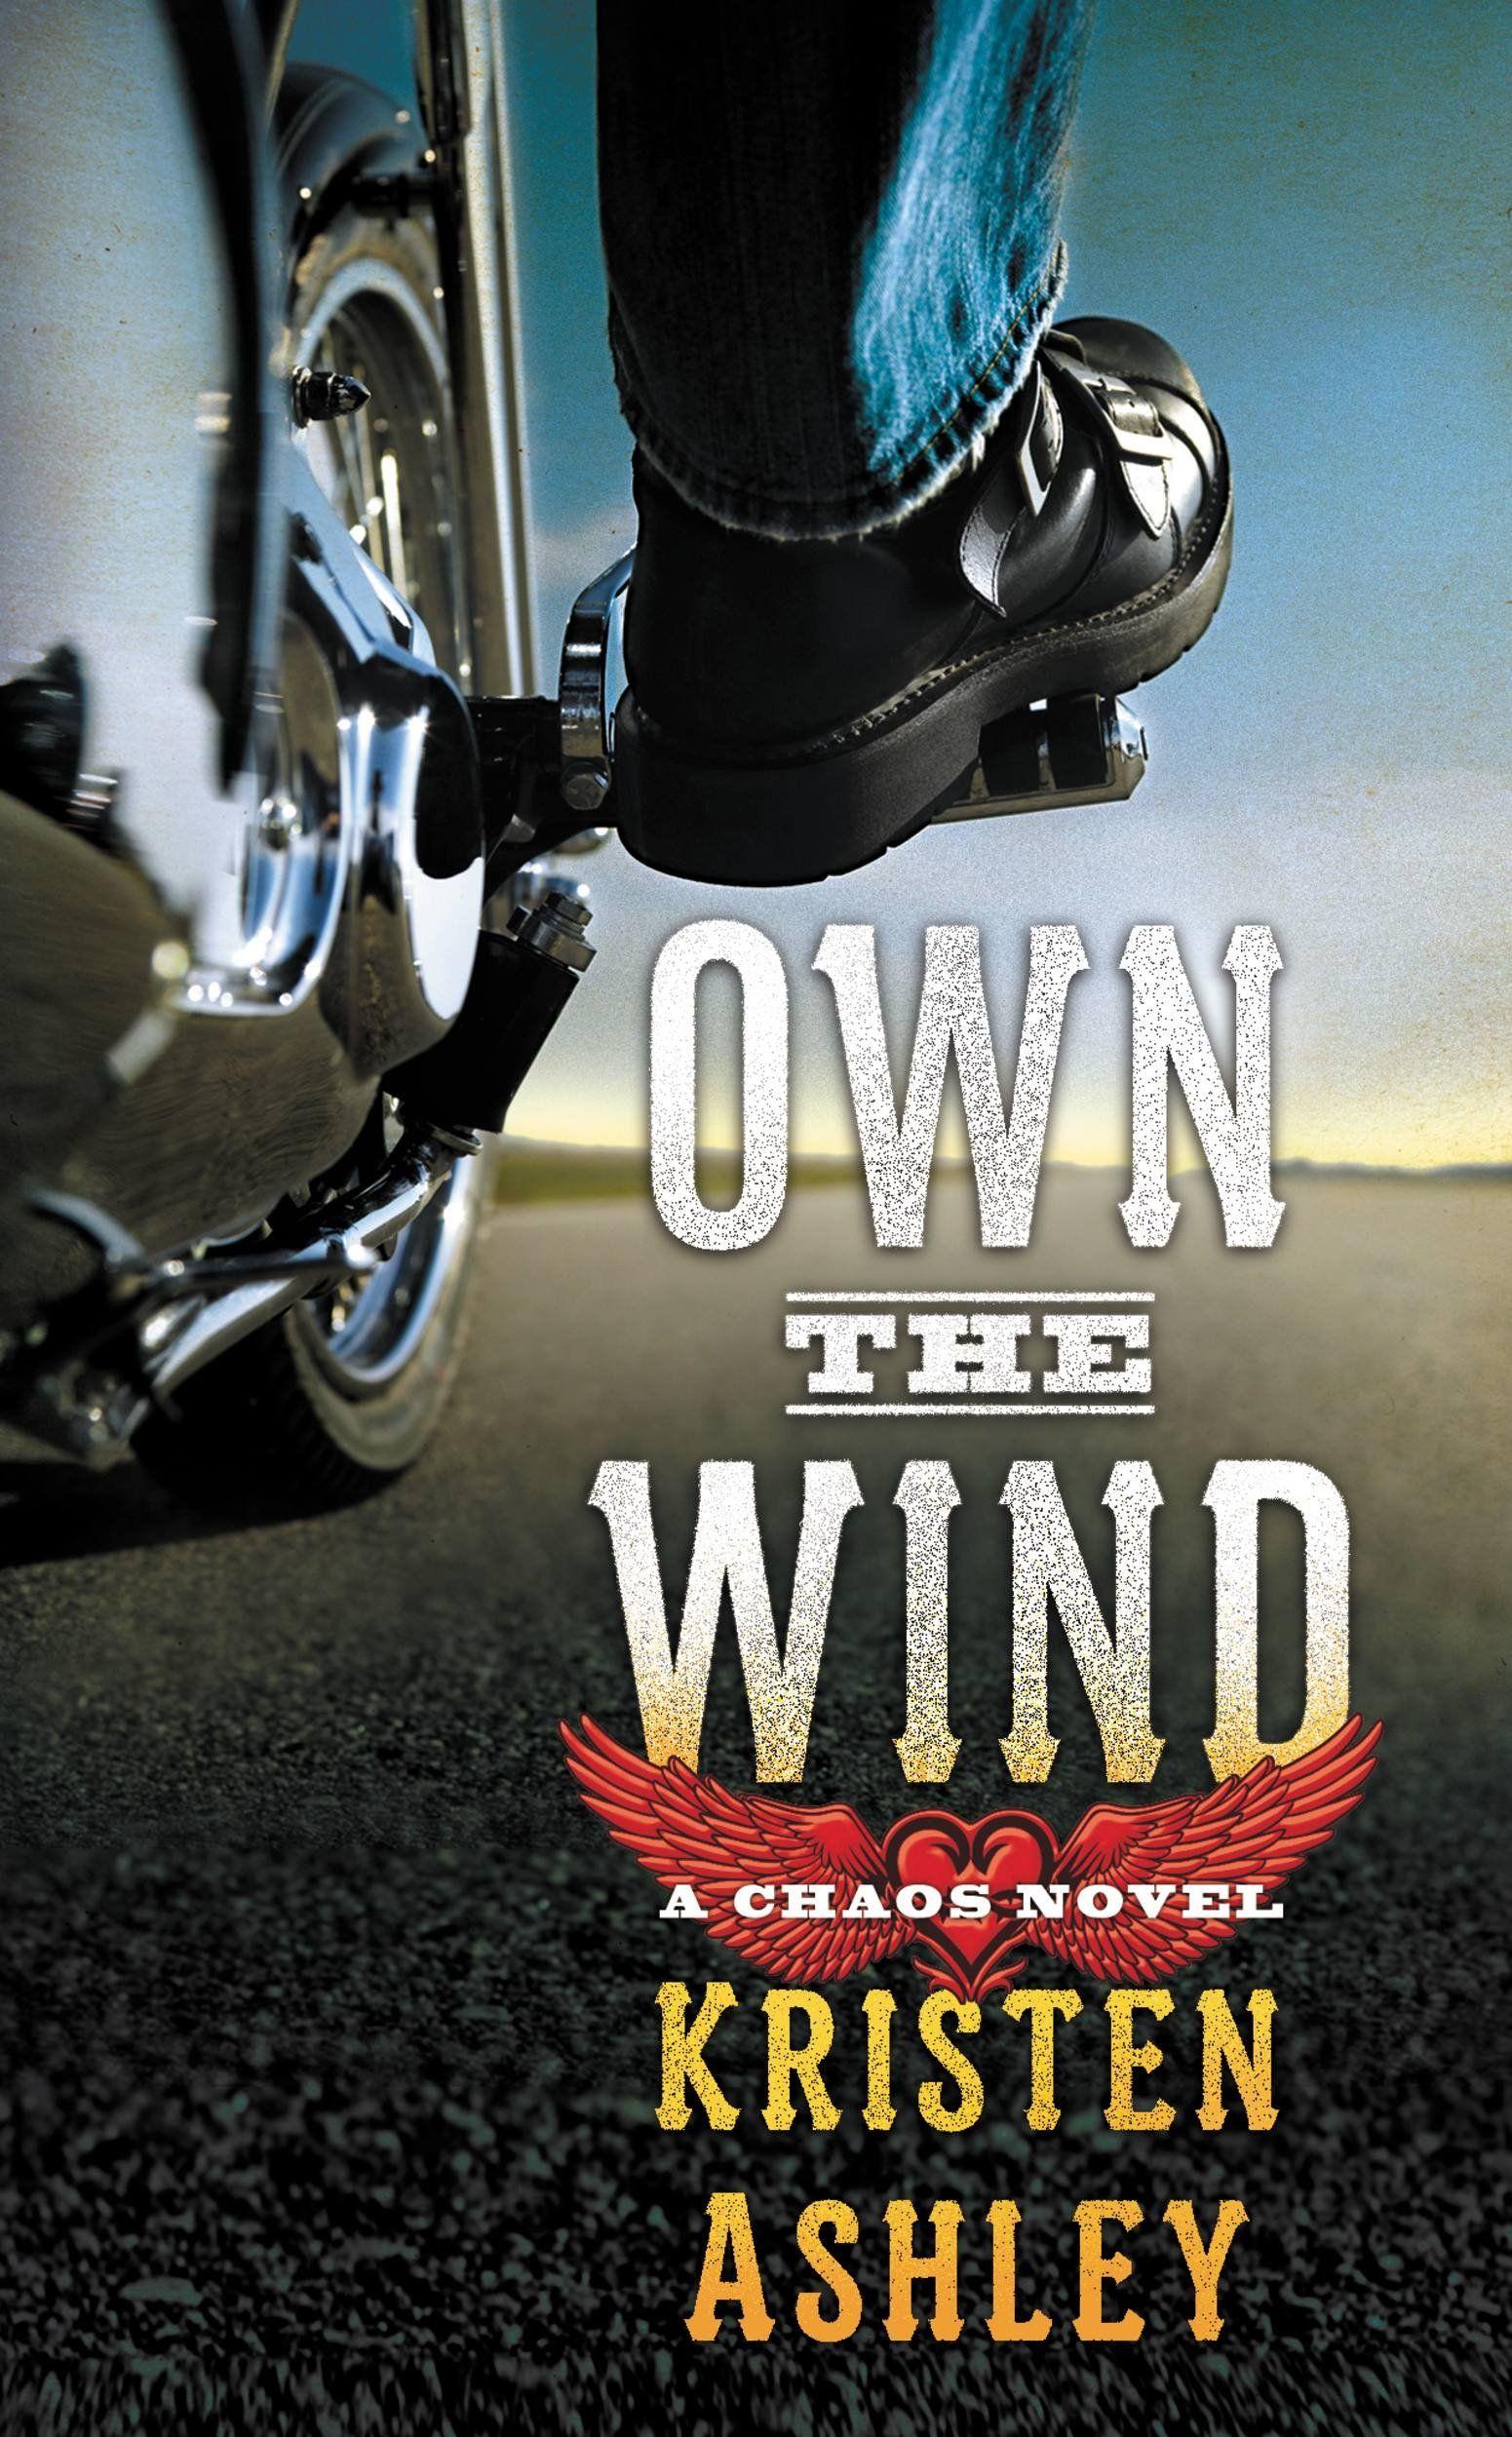 Own The Wind A Chaos Novel Kindle Edition By Kristen Ashley Romance Kindle Ebooks Amazon Com Kristen Ashley Kristen Ashley Books Romance Novels Steamy